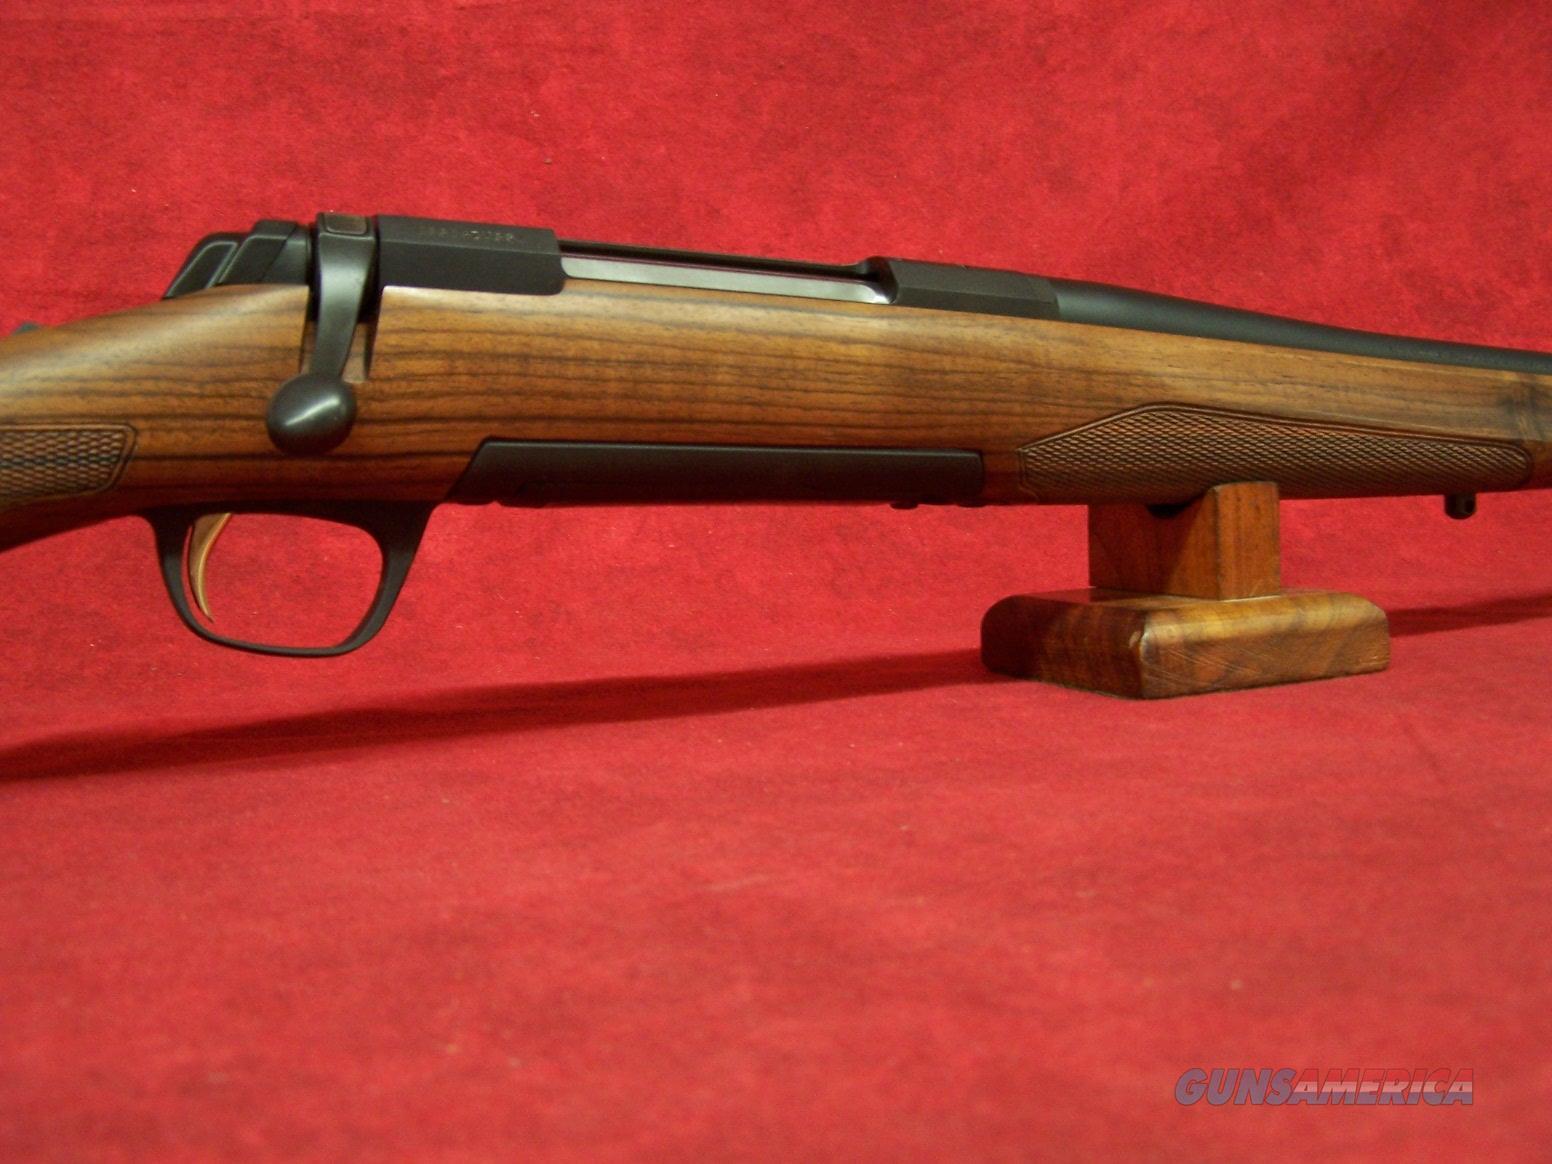 "Browning X-Bolt Hunter French Walnut .30-06Sprg. 22"" Barrel (035365226)  Guns > Rifles > Browning Rifles > Bolt Action > Hunting > Blue"